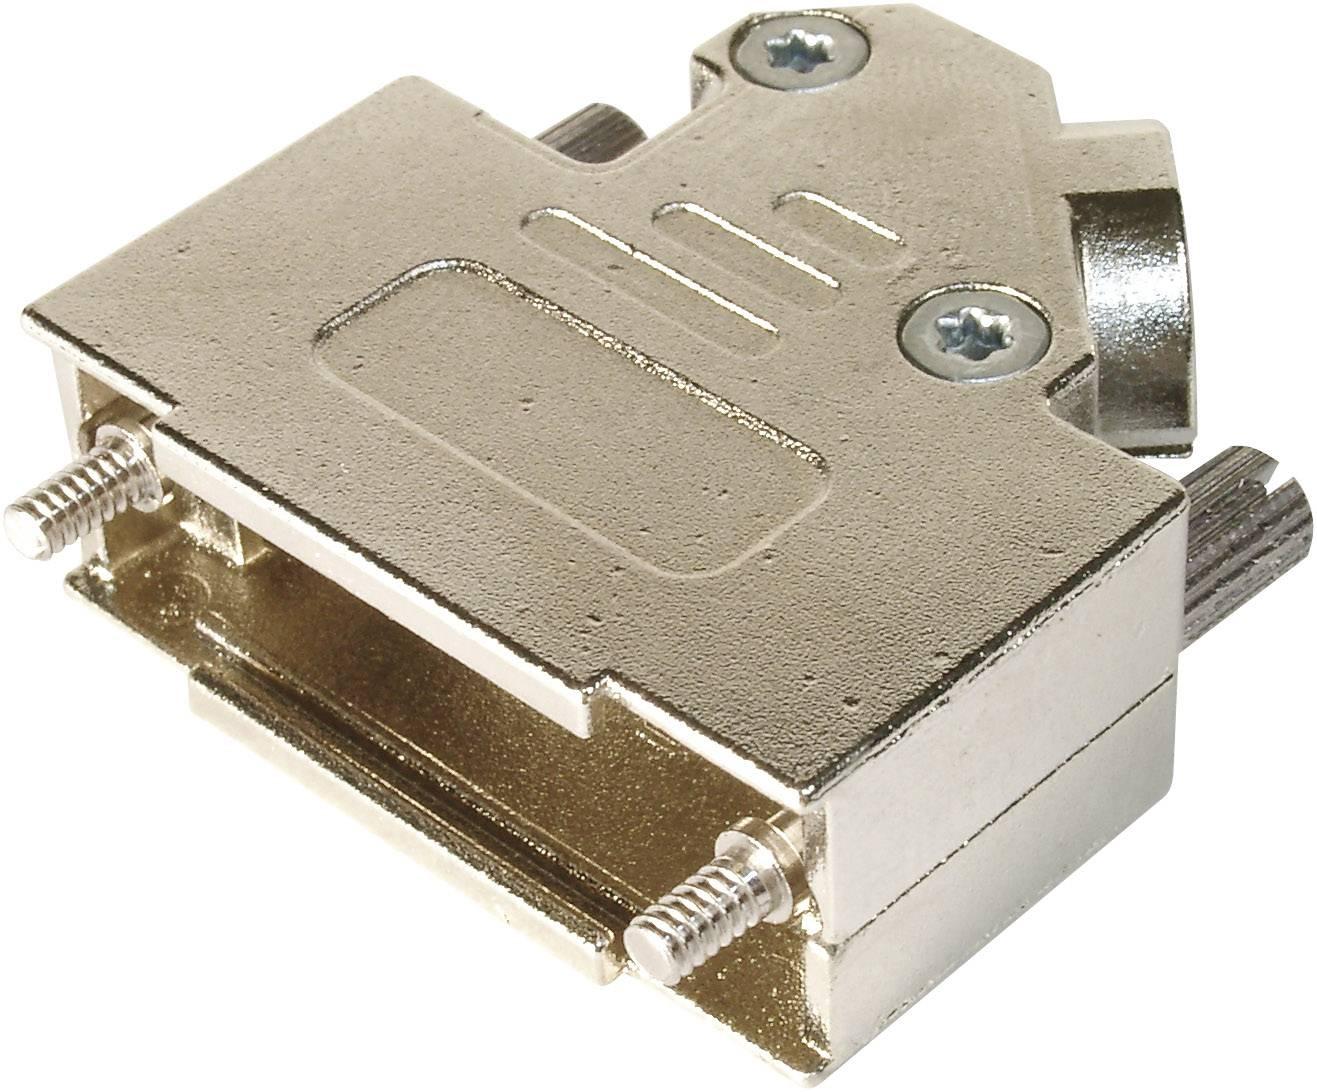 D-SUB kryt Assmann AMET-15 RS-45, 15 pin, 45 st